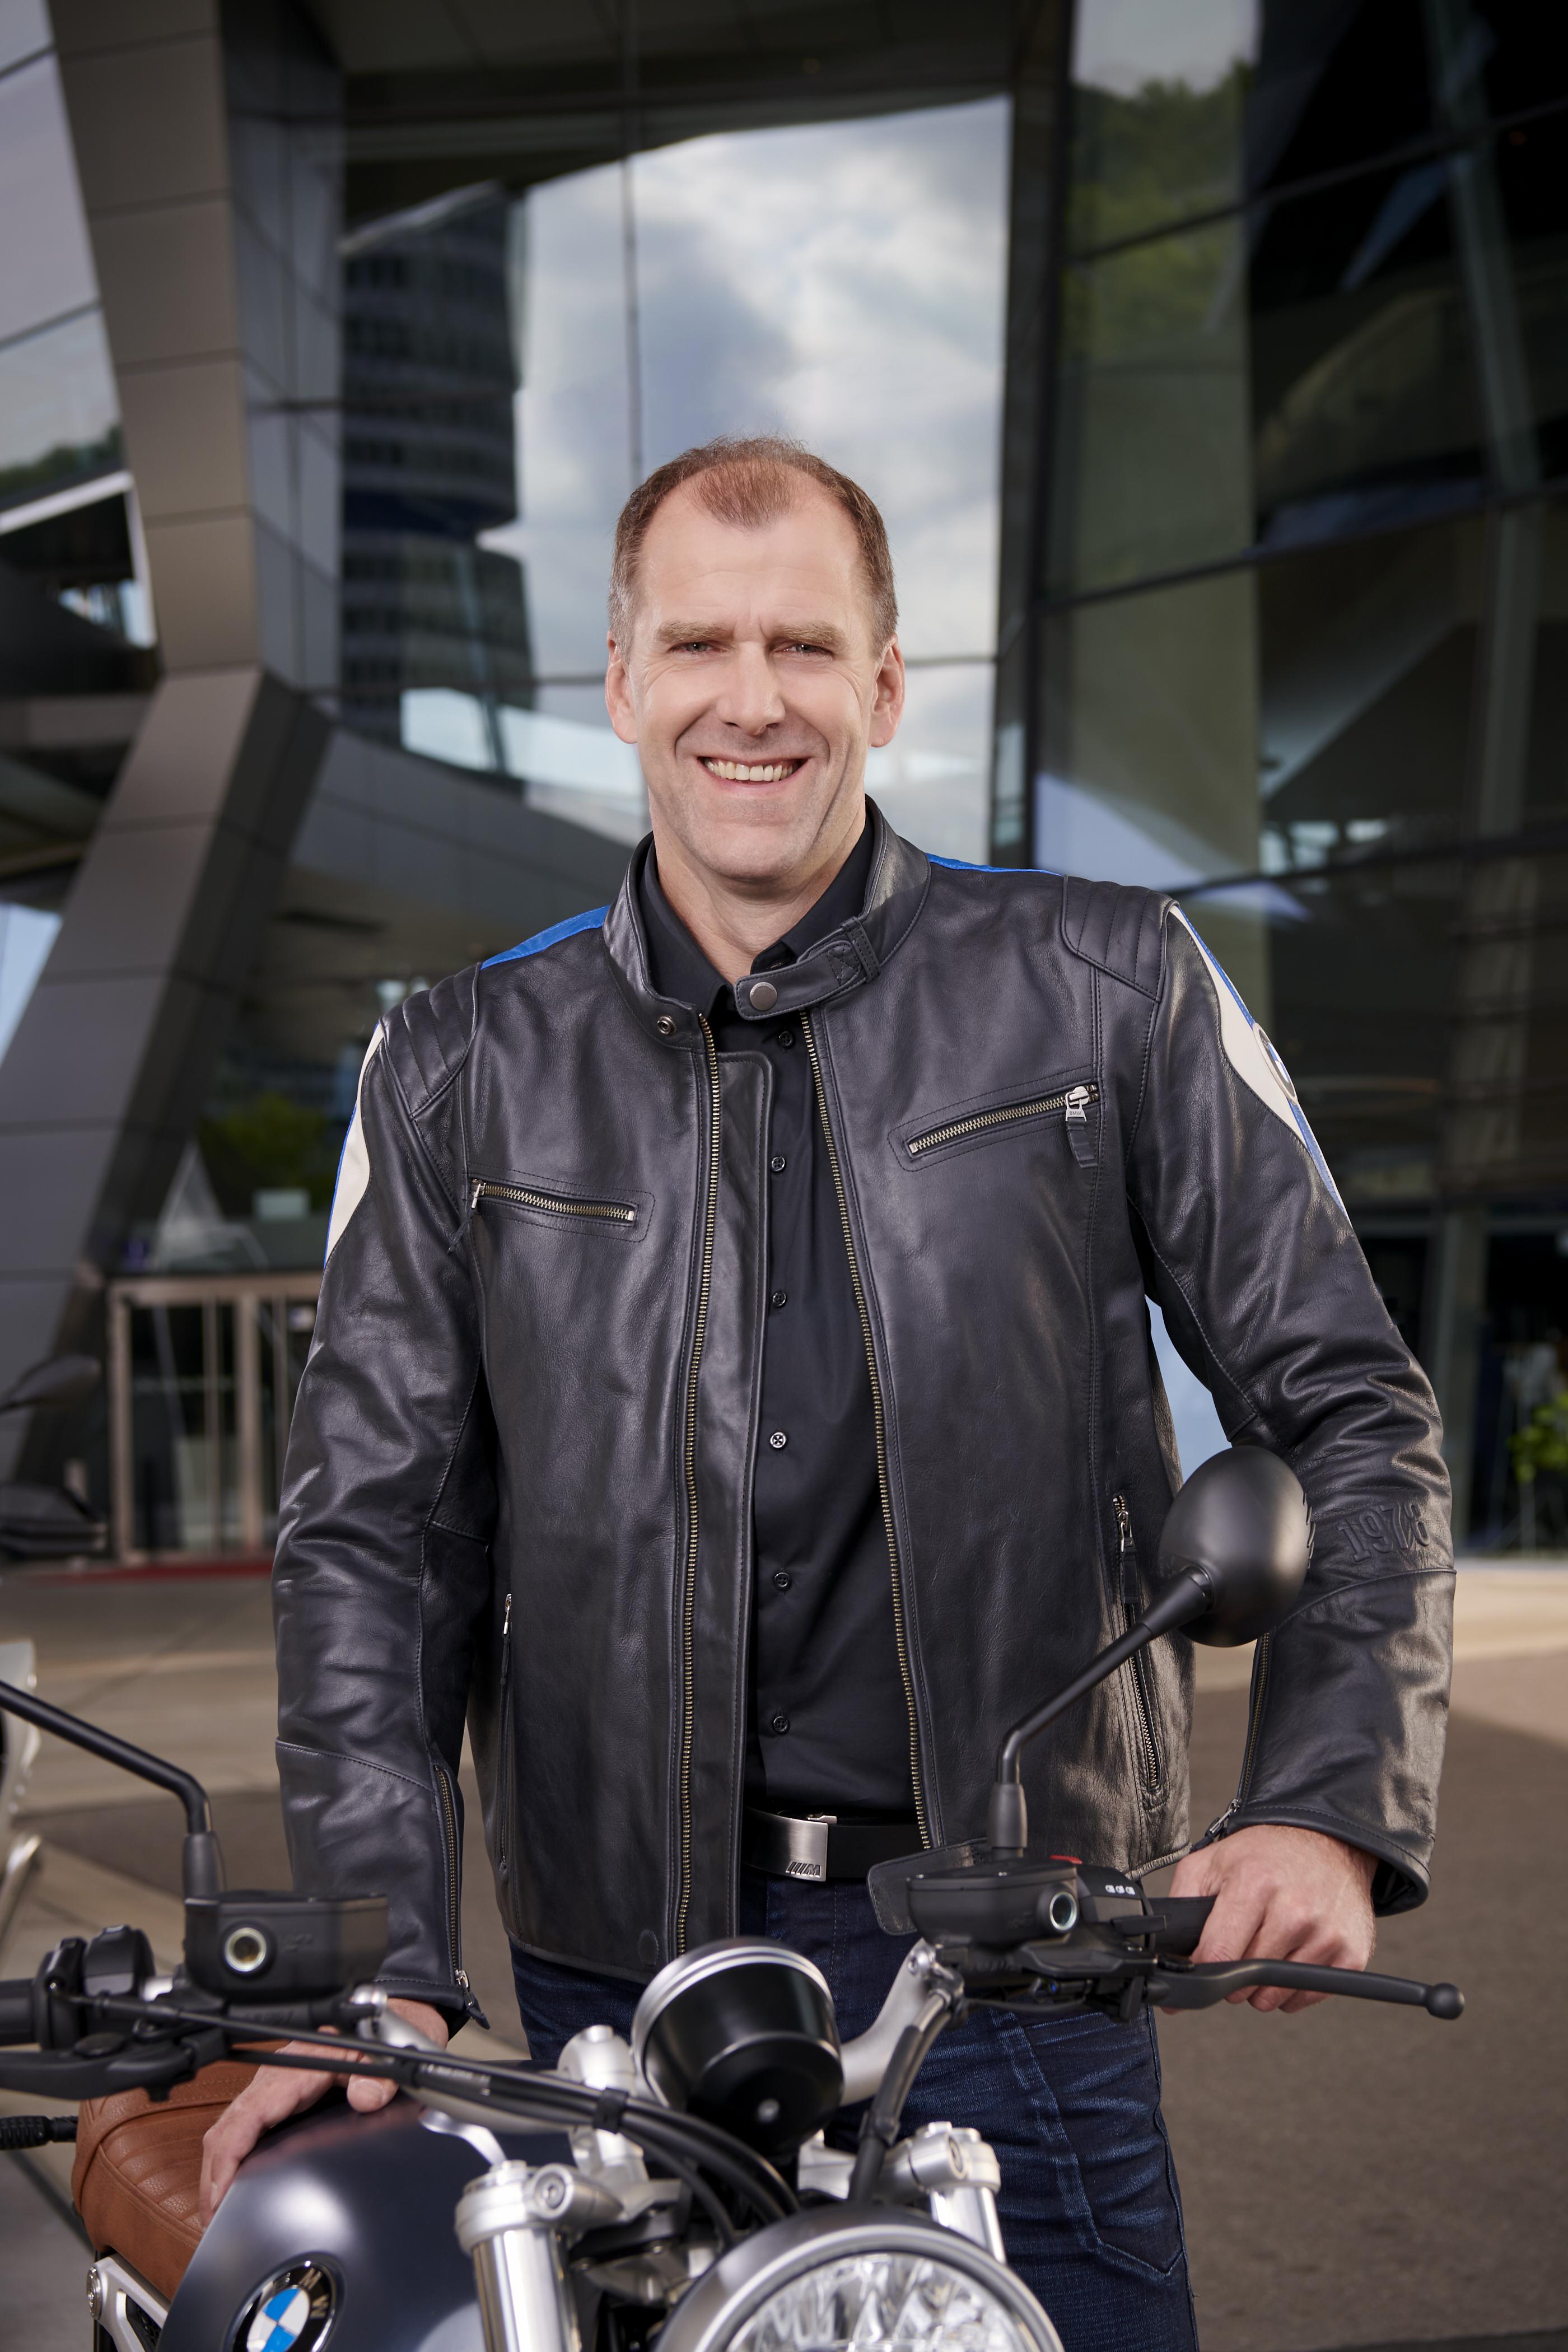 2019 Christof Lischka Profile Picture